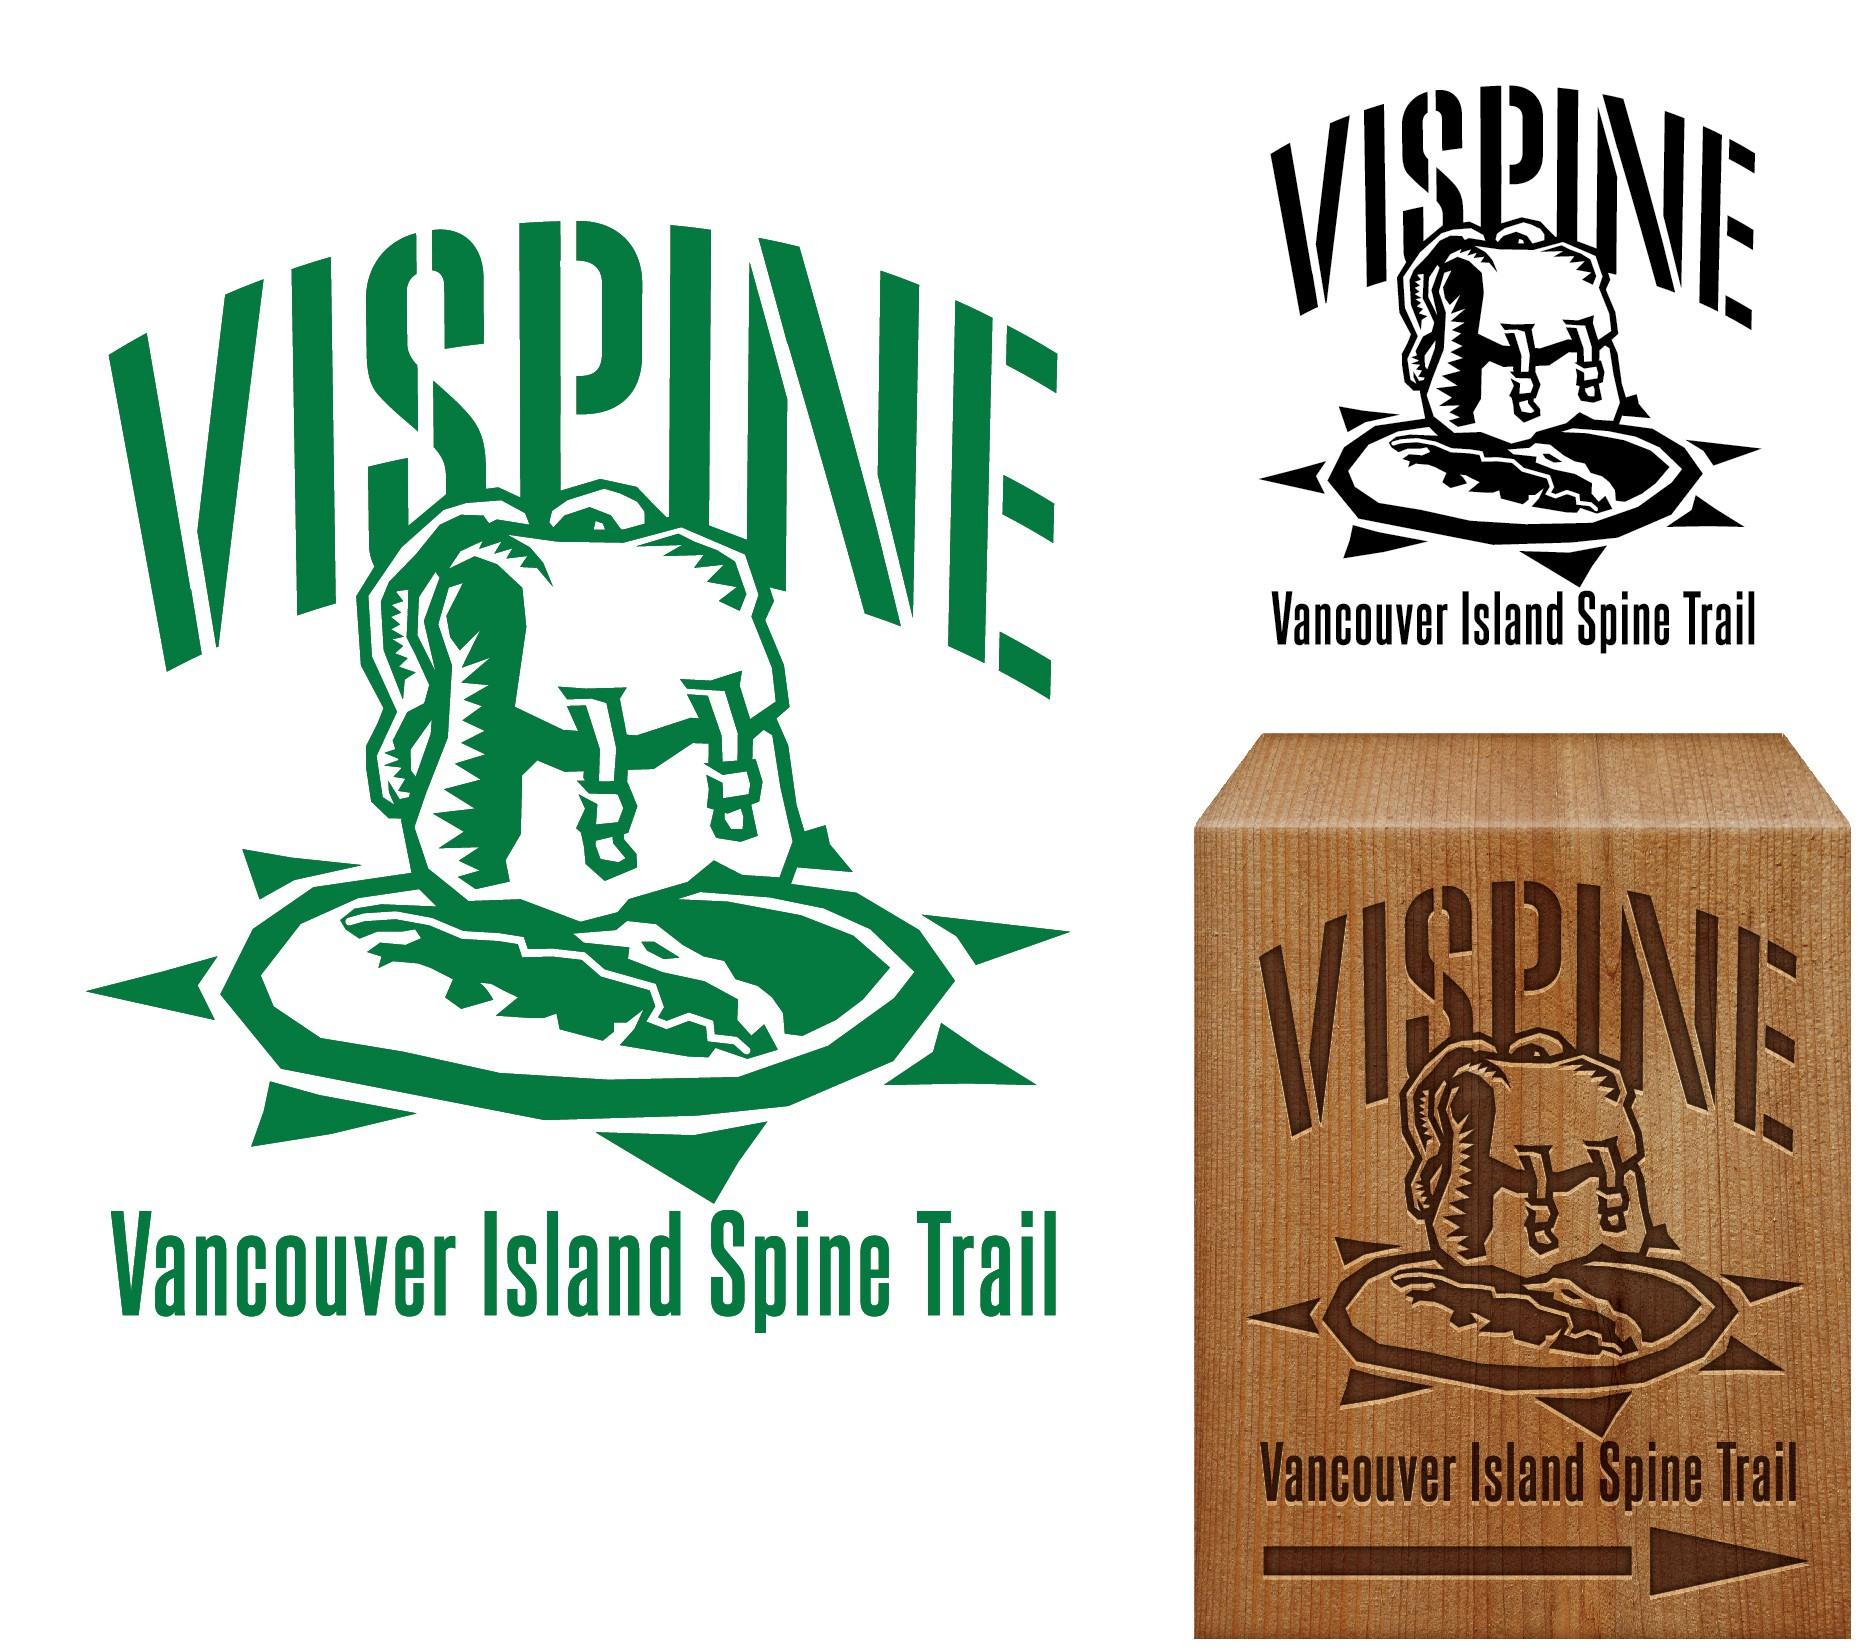 World class hiking trail logo/marker (VISPINE)